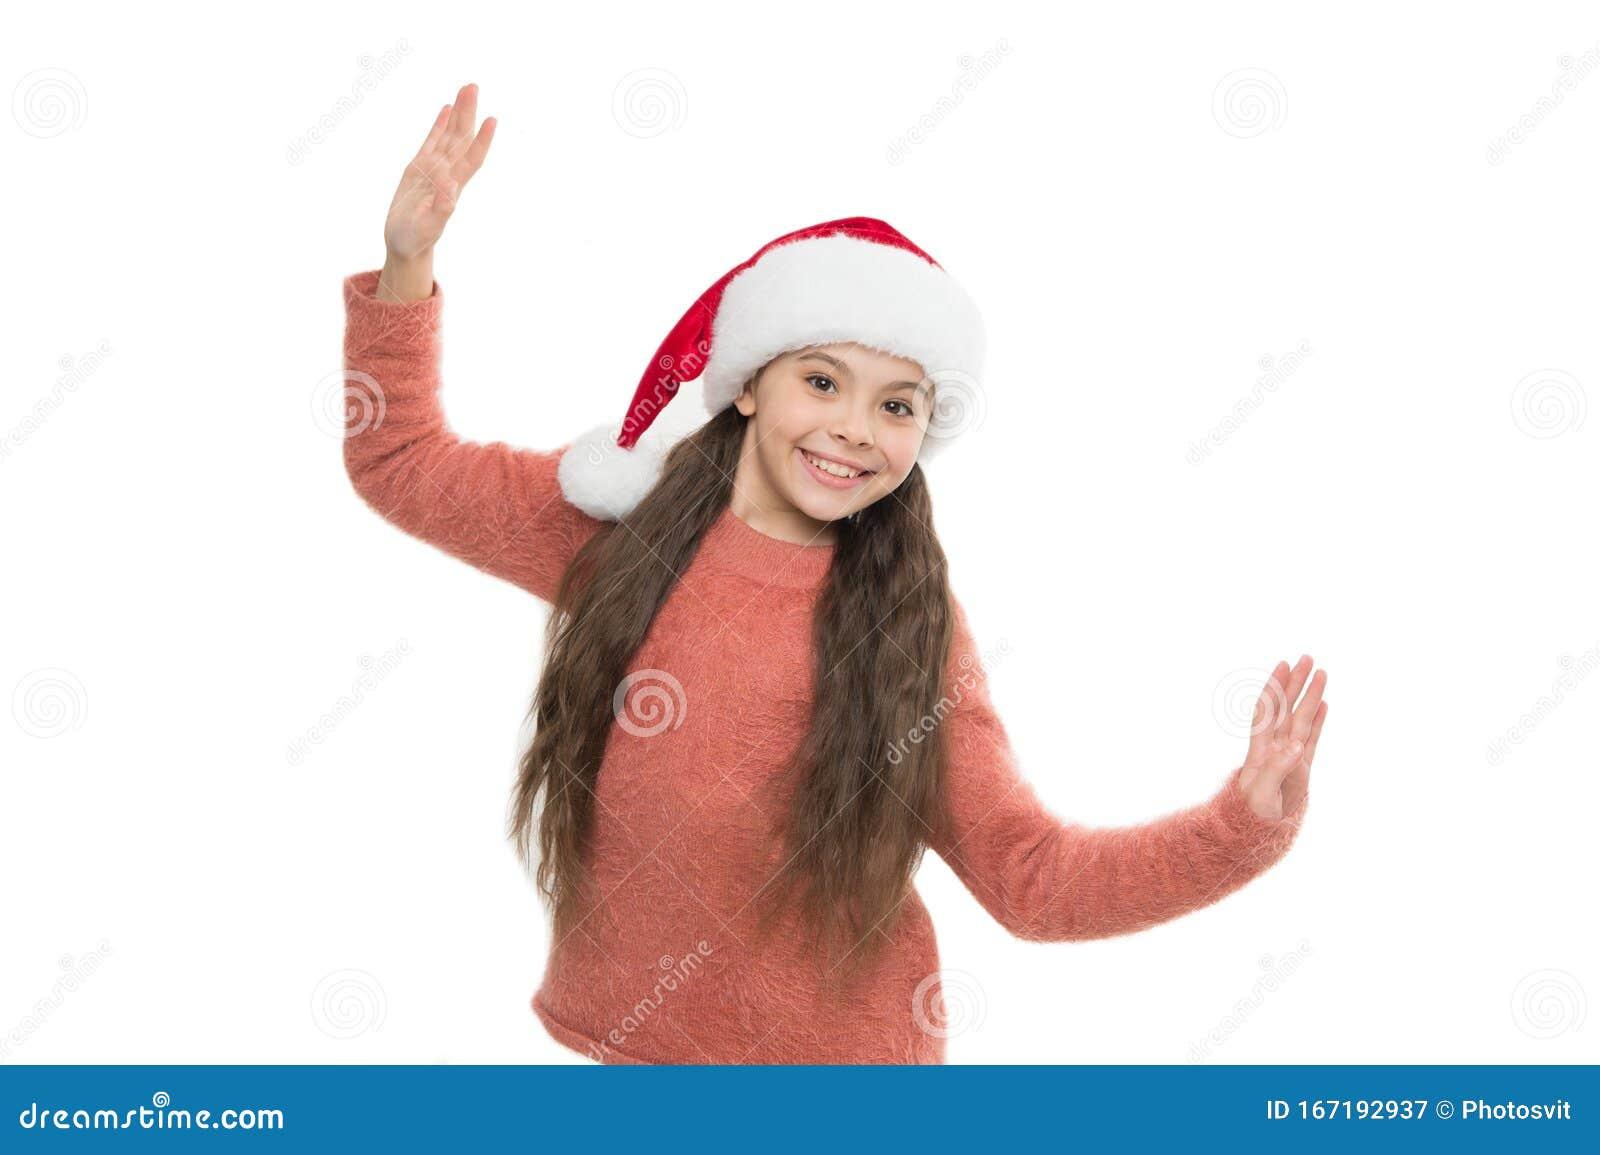 Dance All Night. Respect Traditions. Winter Spirit. New ... Respect Hat Kid